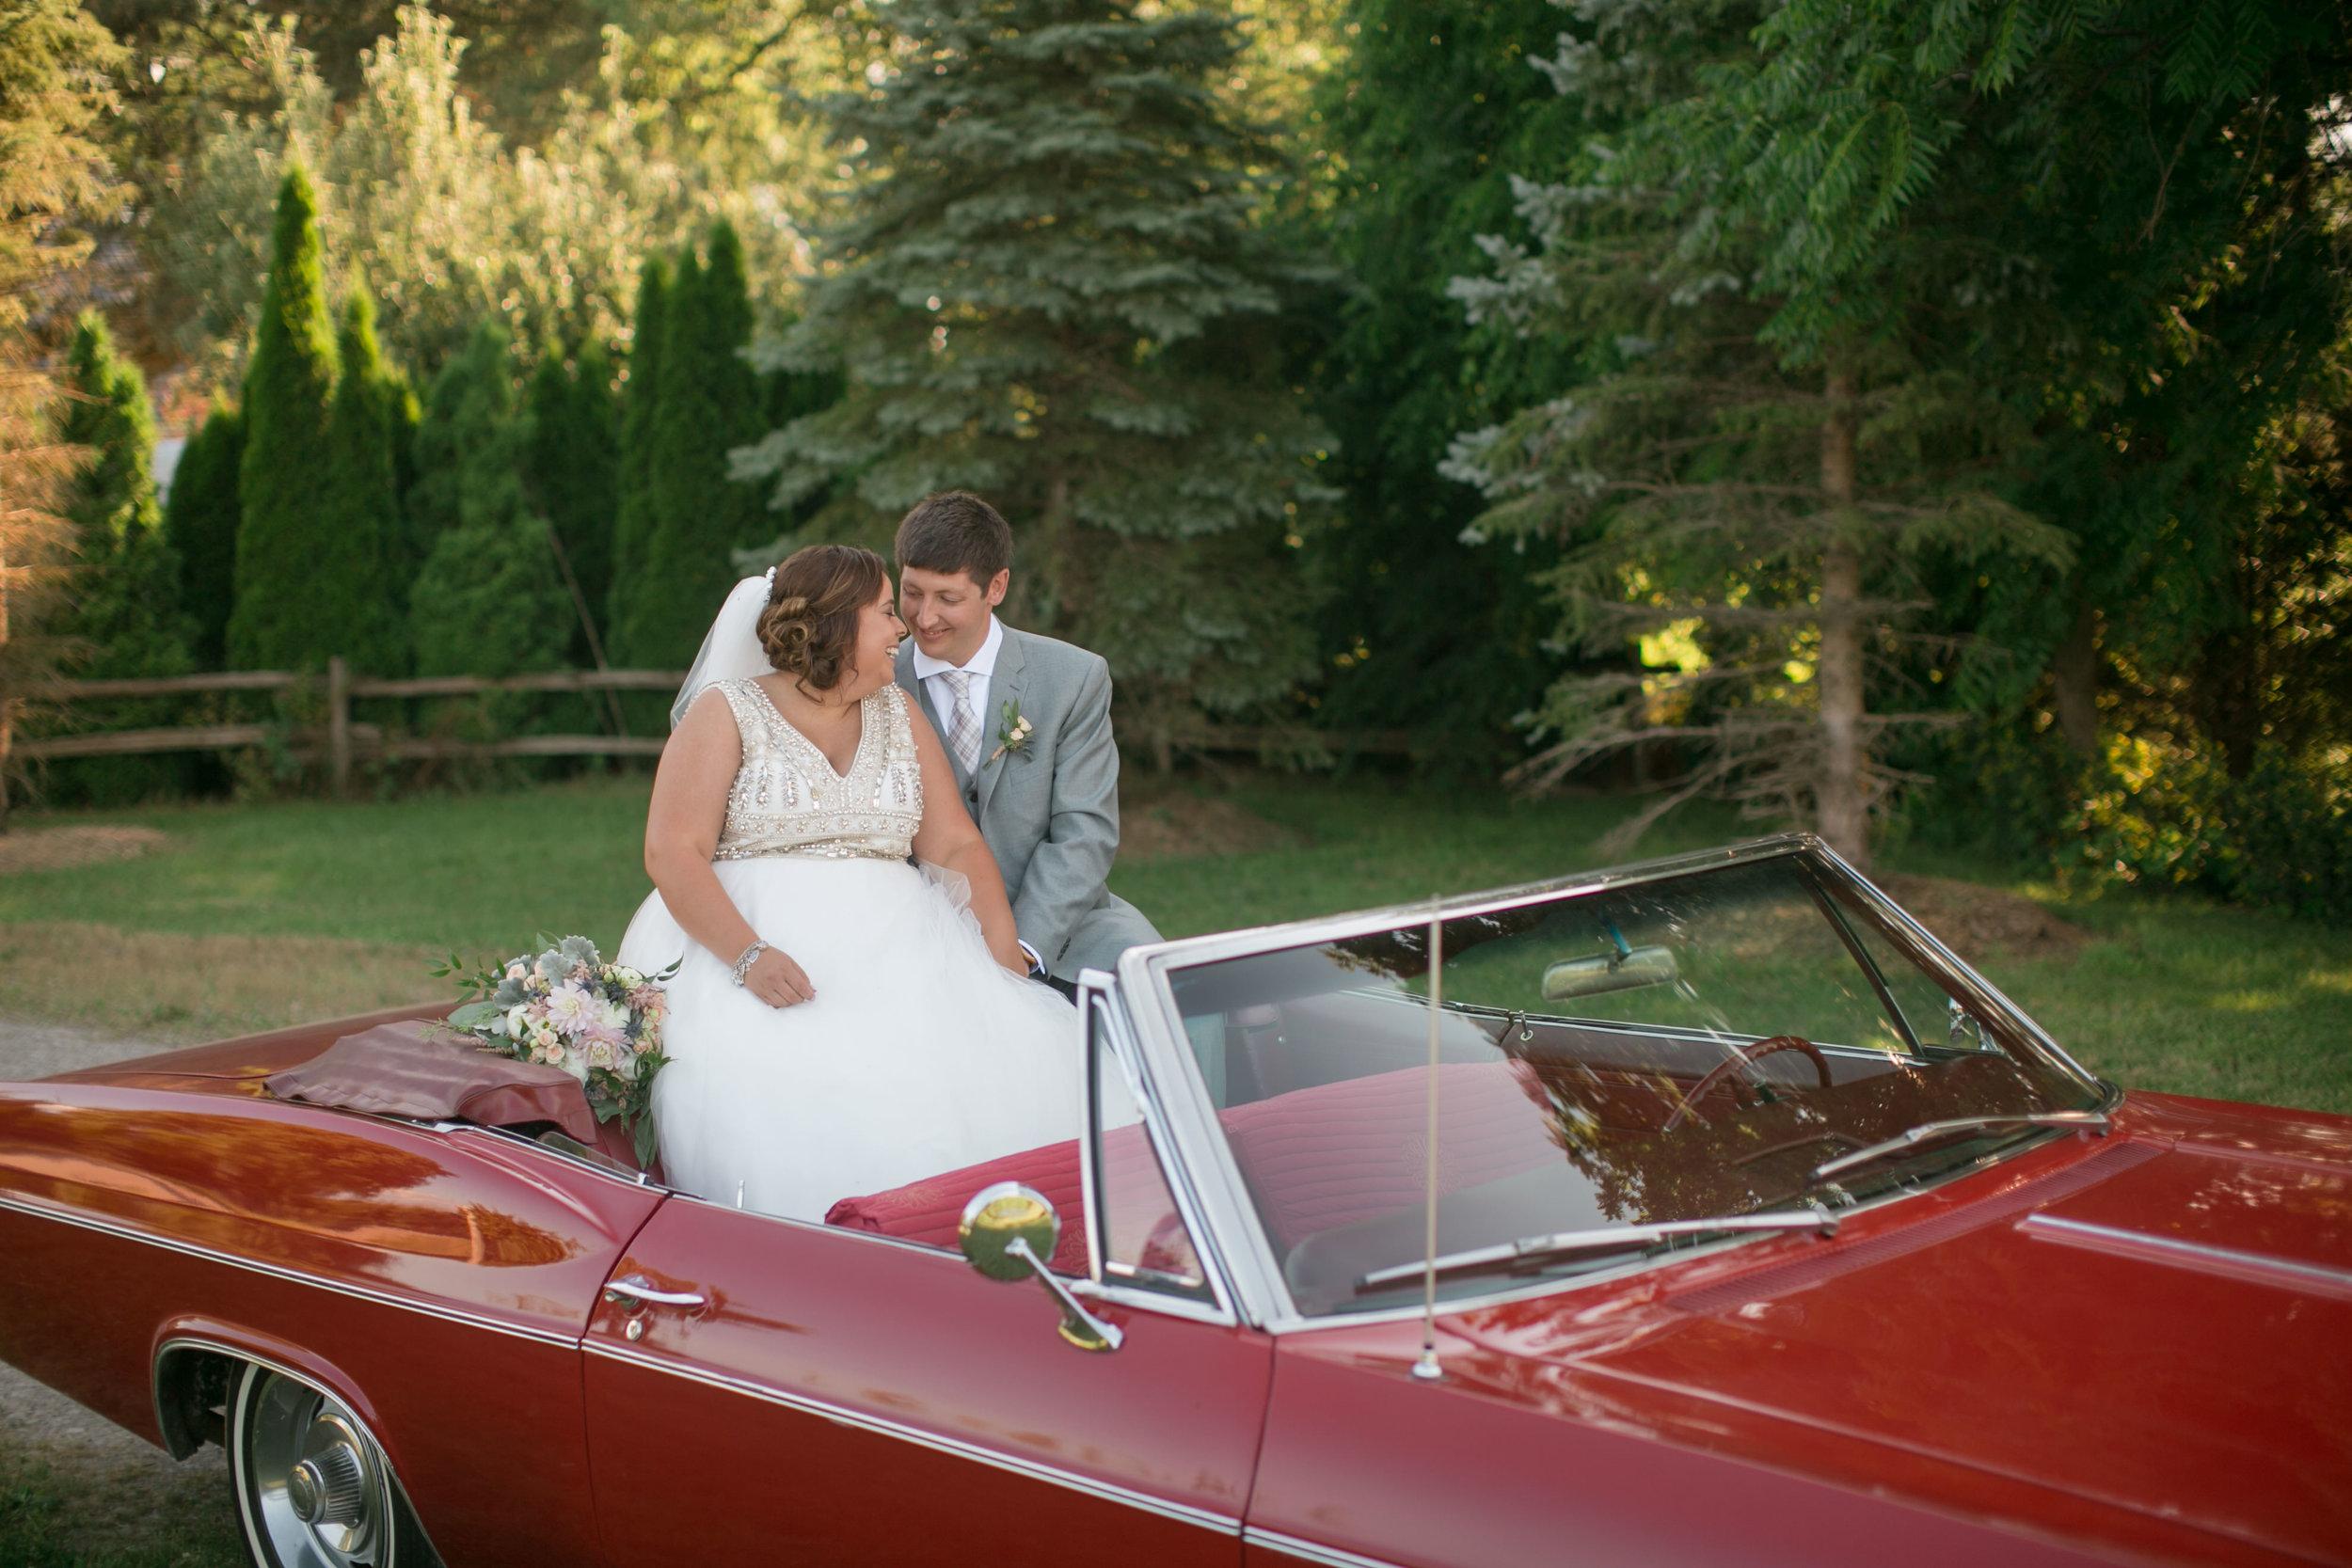 Kimberley + Cameron - Daniel Ricci Weddings - High Res. Finals-444.jpg